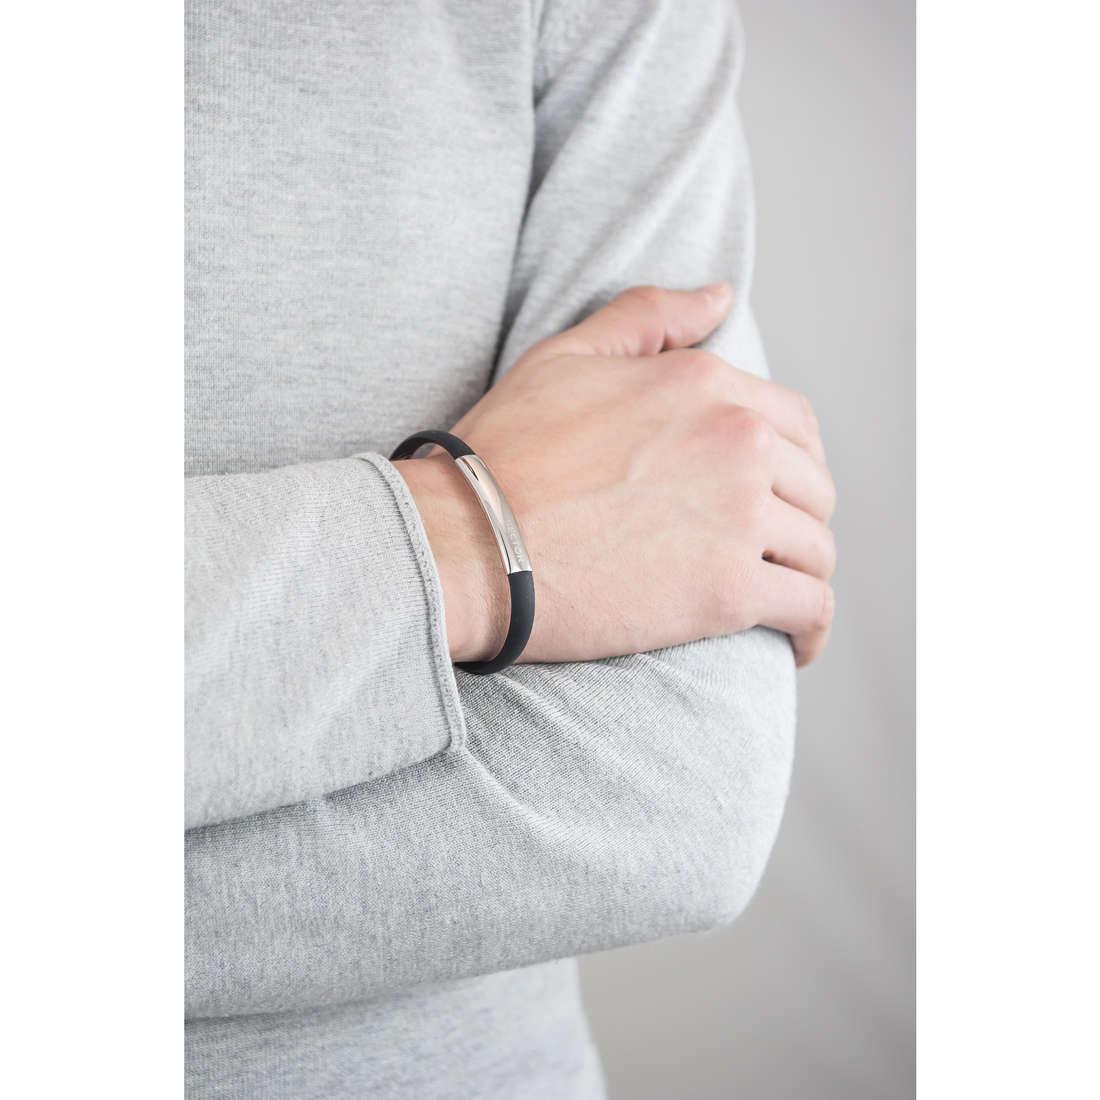 Sector bracciali Basic Soft uomo SAFB02 indosso